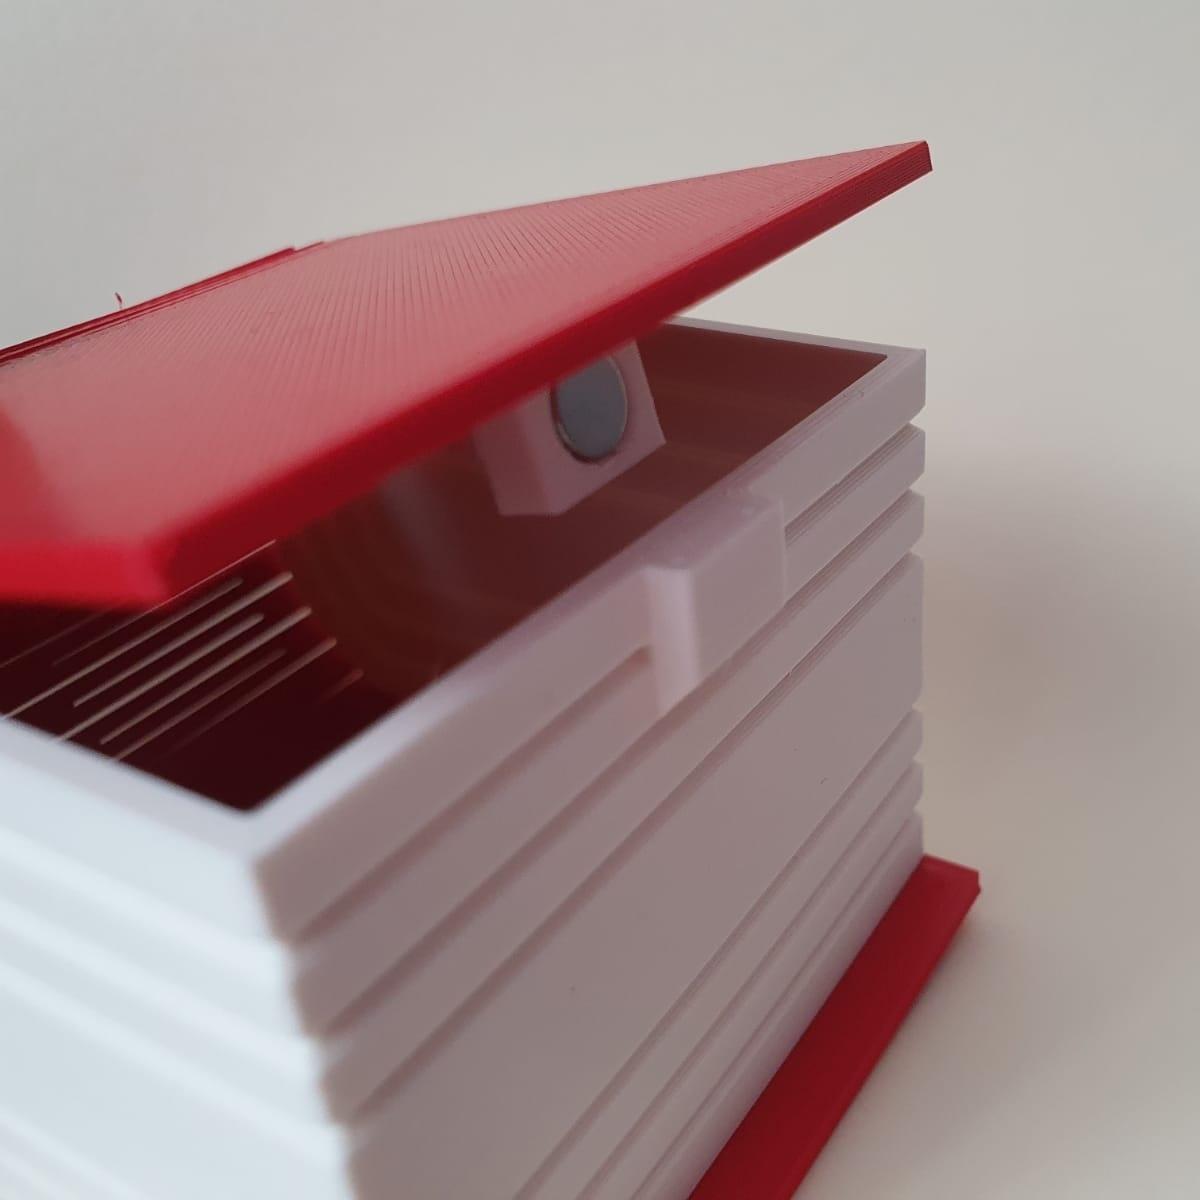 IMG_20201005_174545.jpg Download STL file Living hinge box #1 • Design to 3D print, the-lazy-engineer